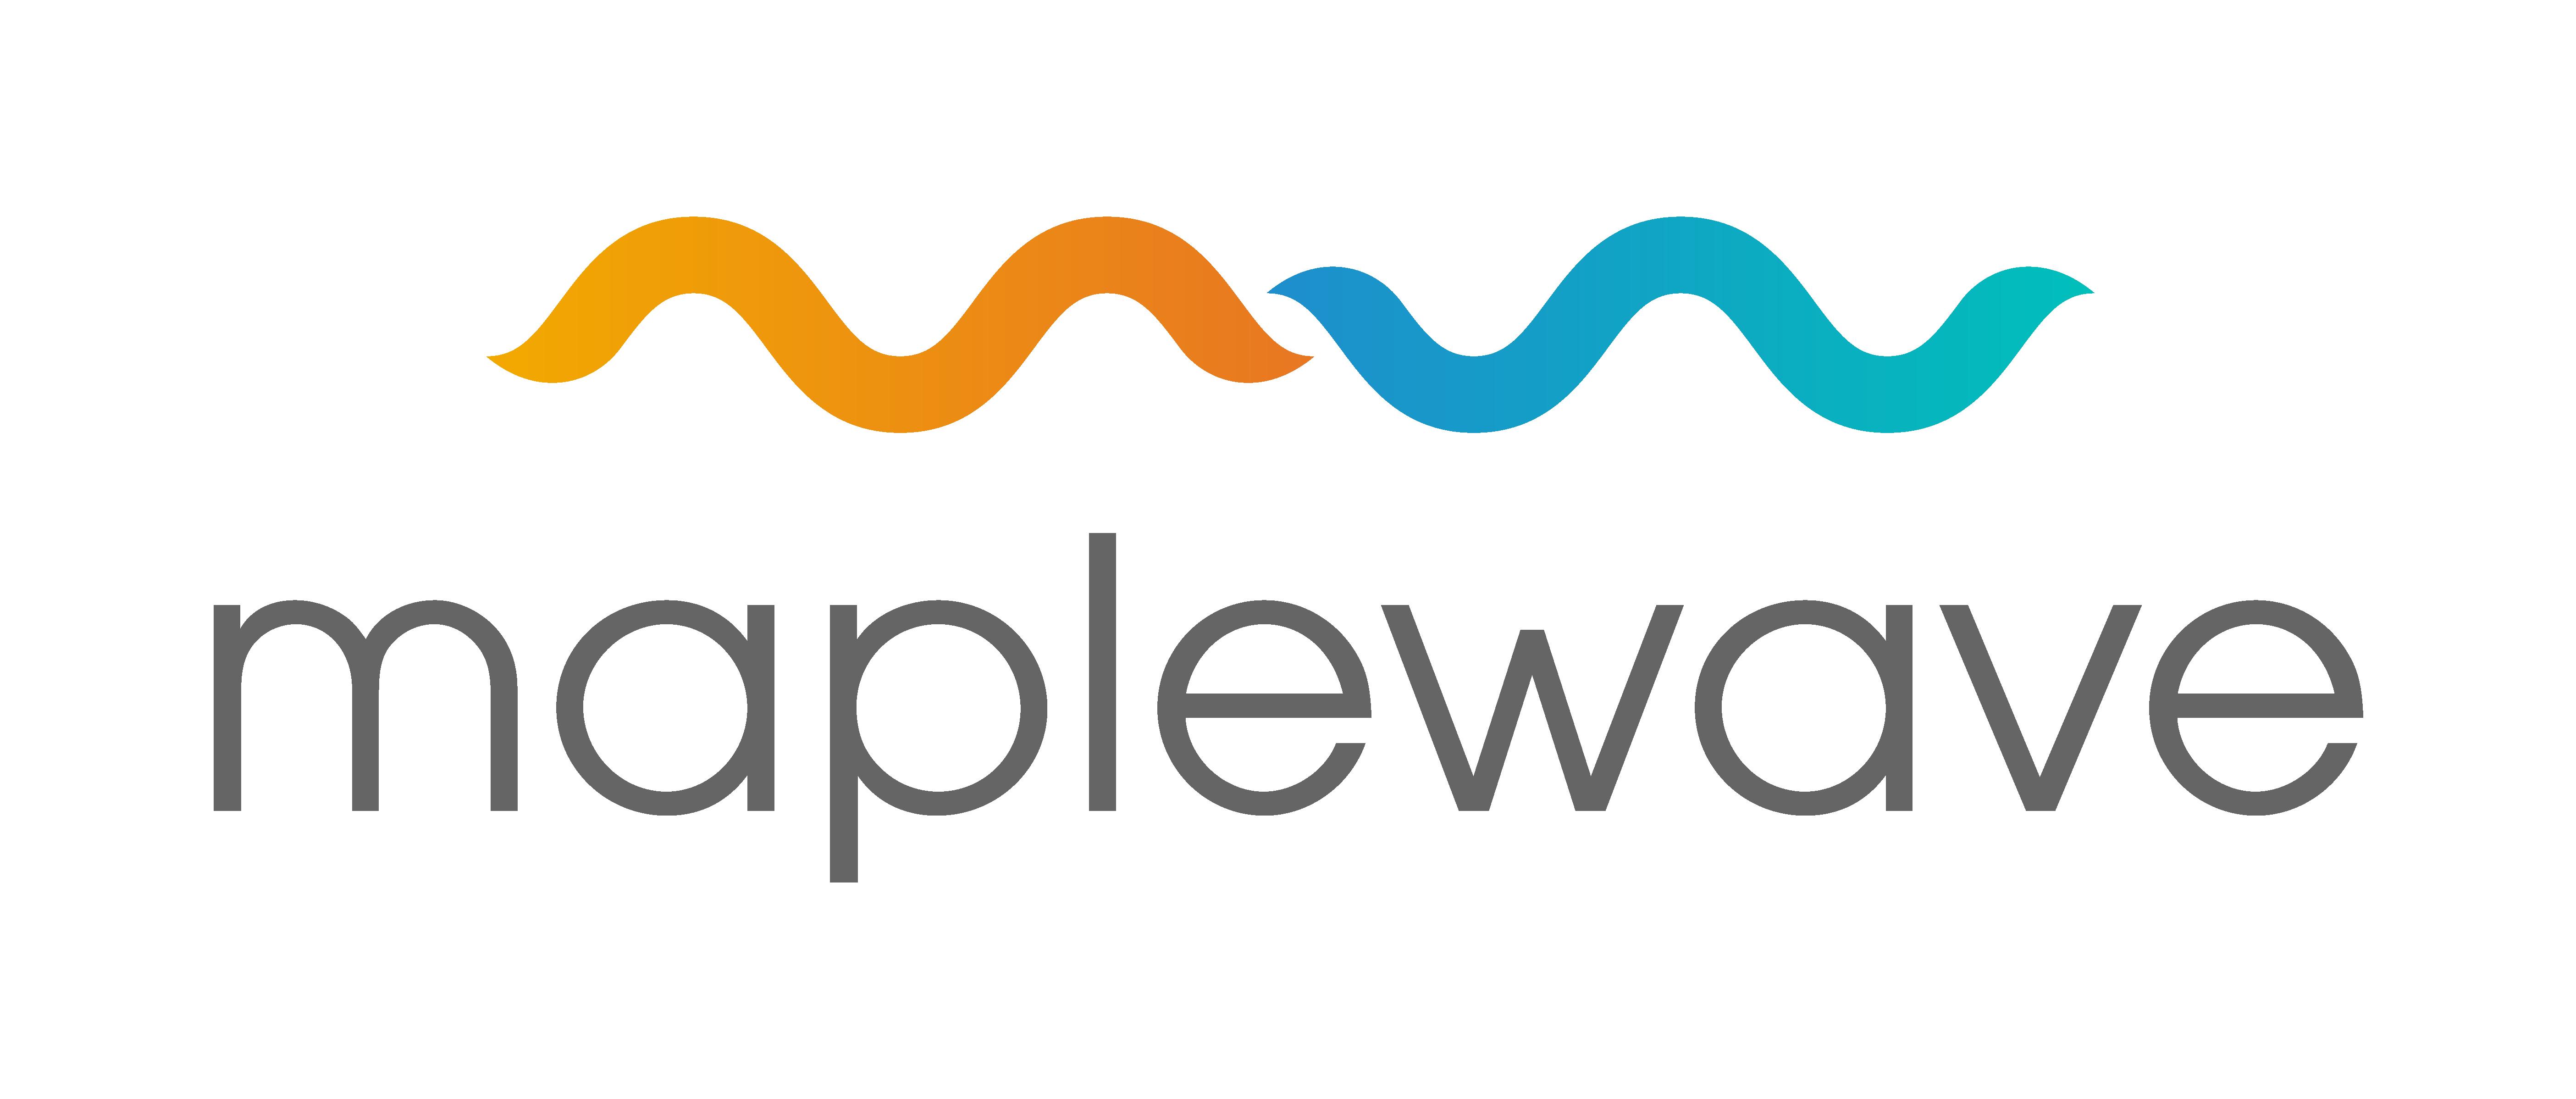 Maplewave company logo